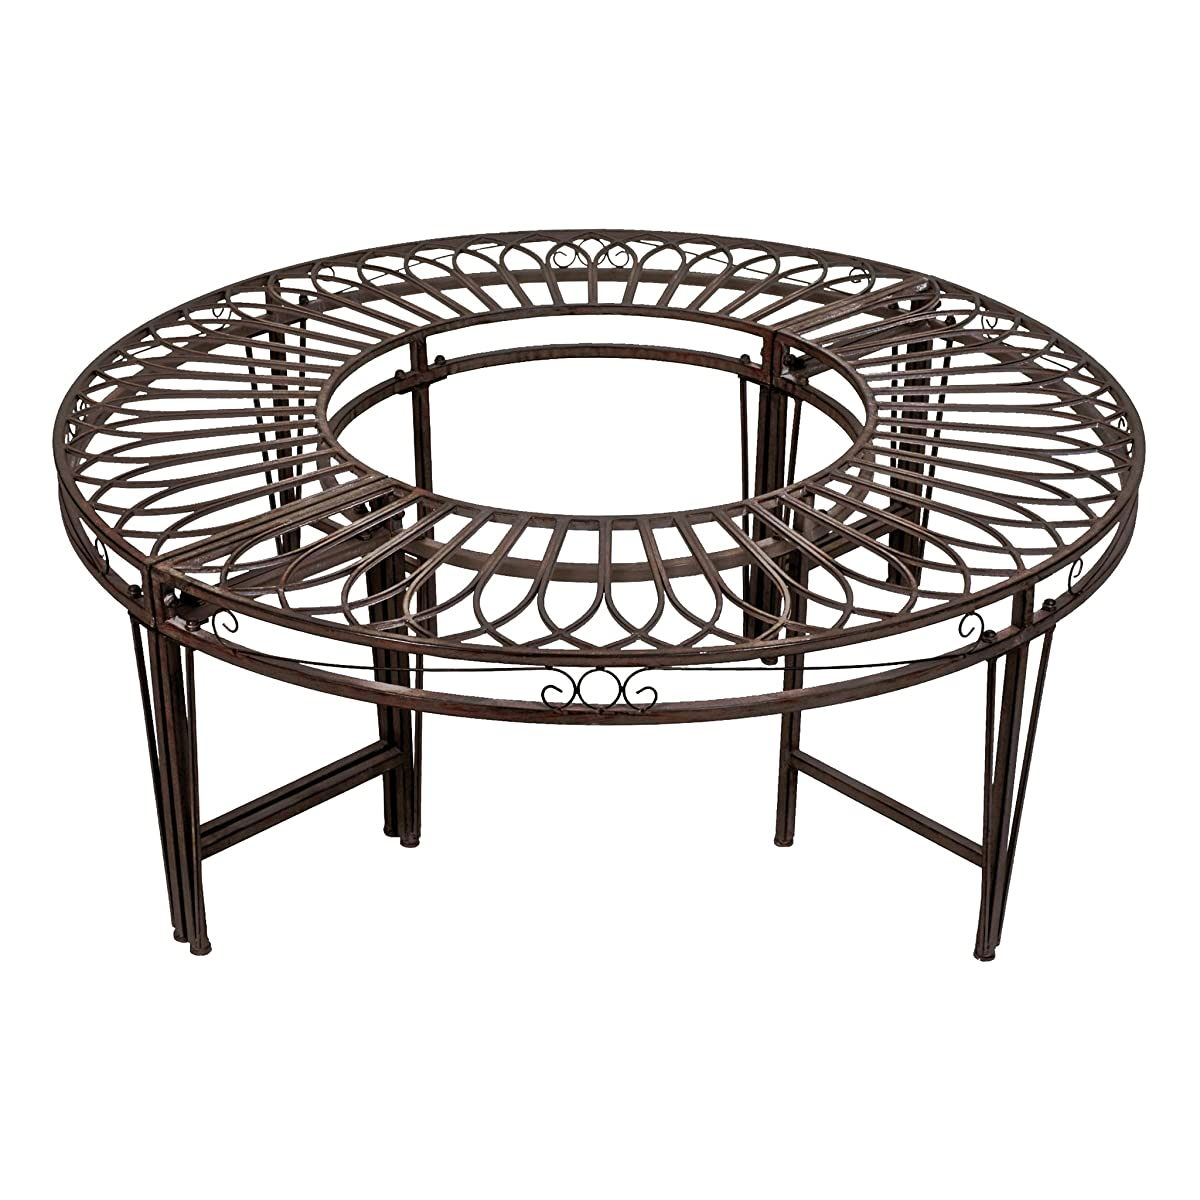 Design Toscano Roundabout Circular Garden Tree Bench Seat, 47 Inch, Steel Metalware, Grey